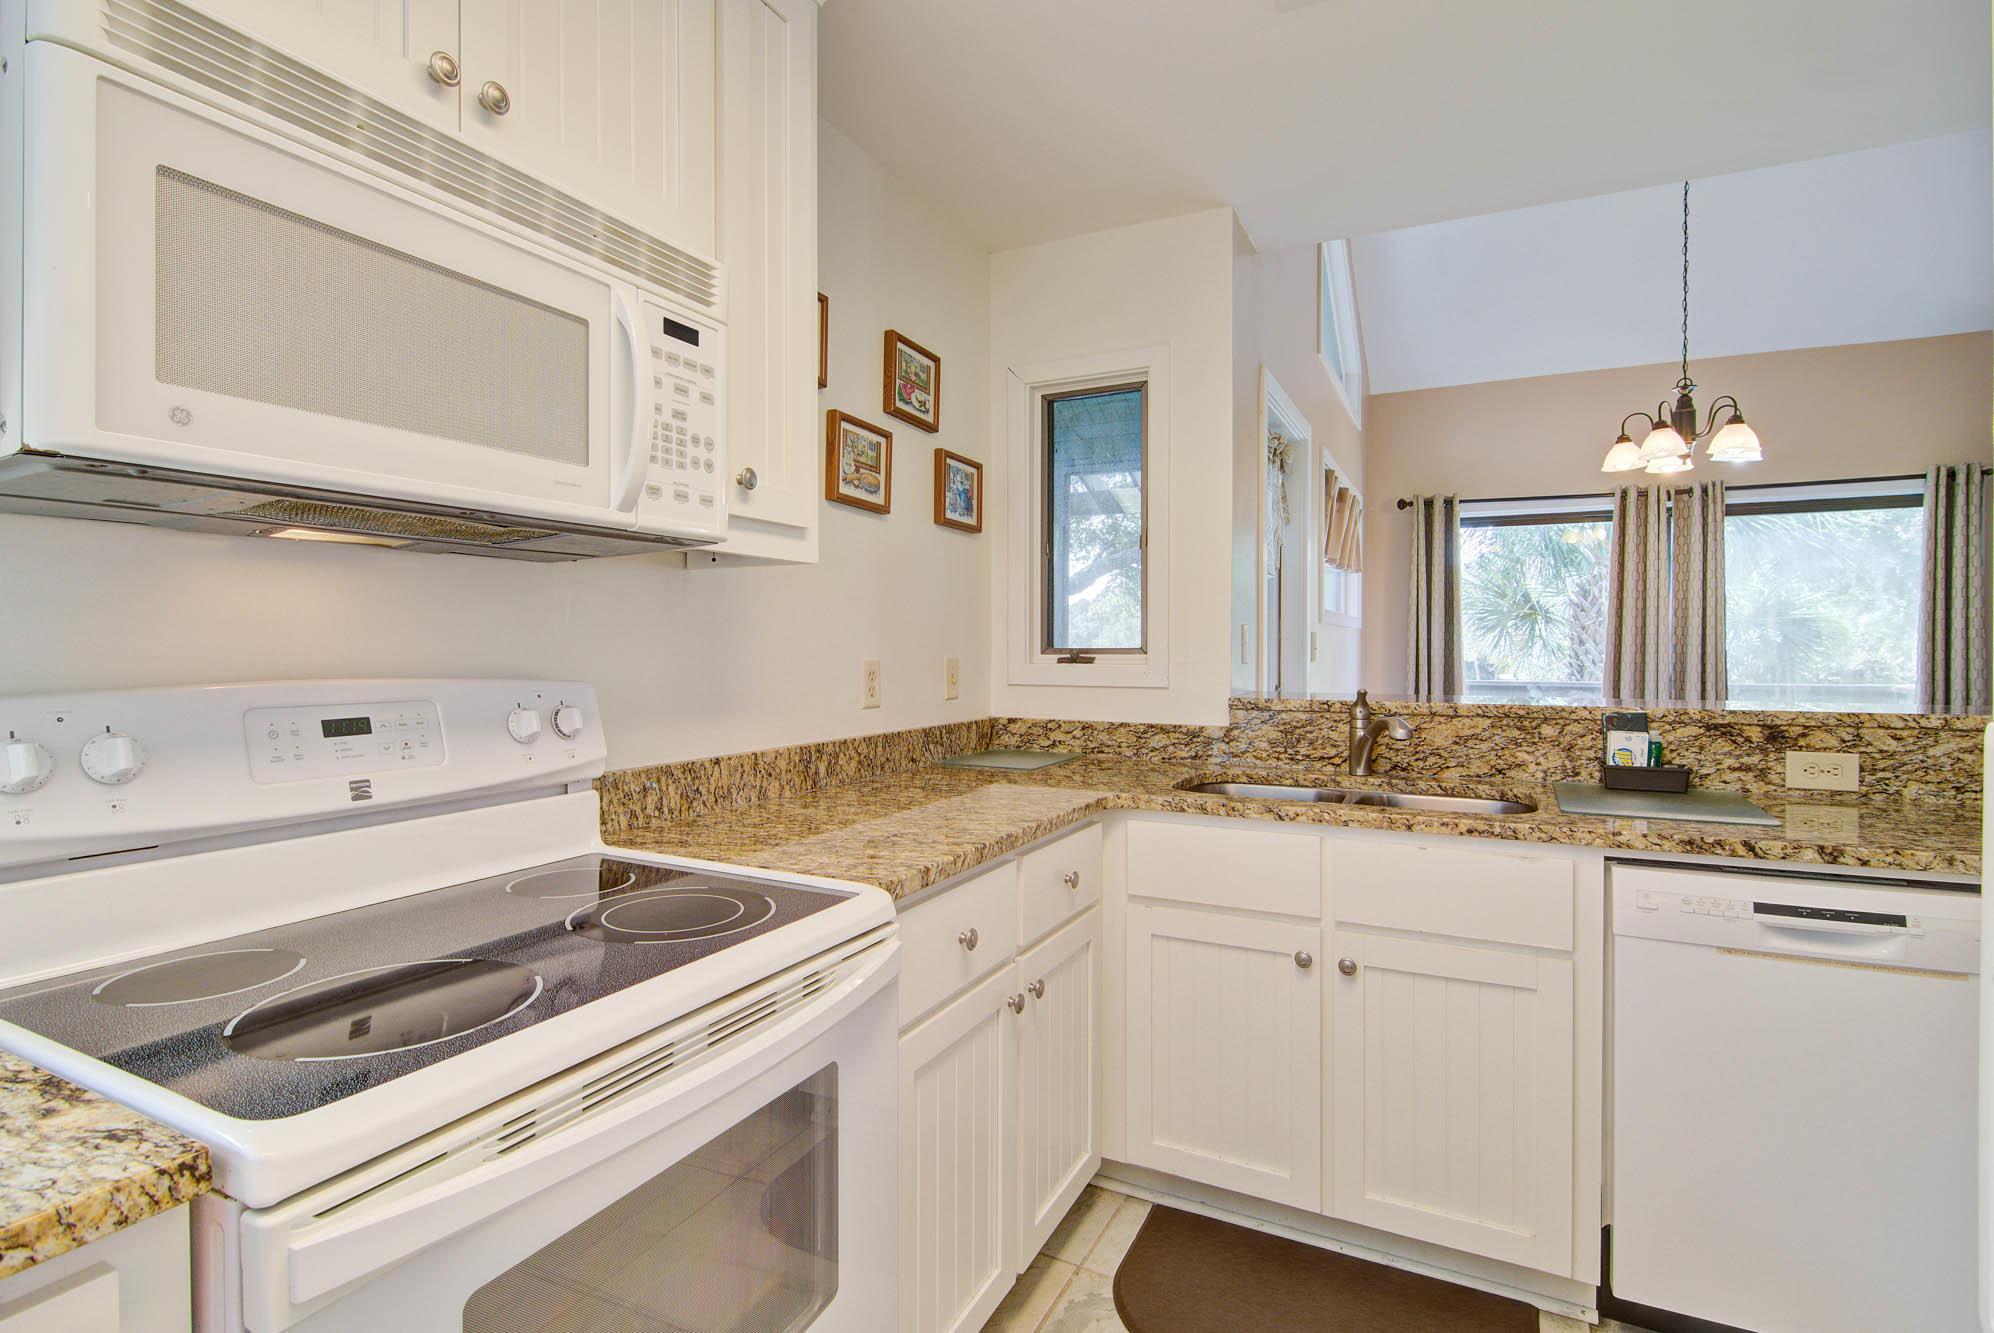 Kiawah Island Homes For Sale - 4504 Park Lake, Kiawah Island, SC - 5